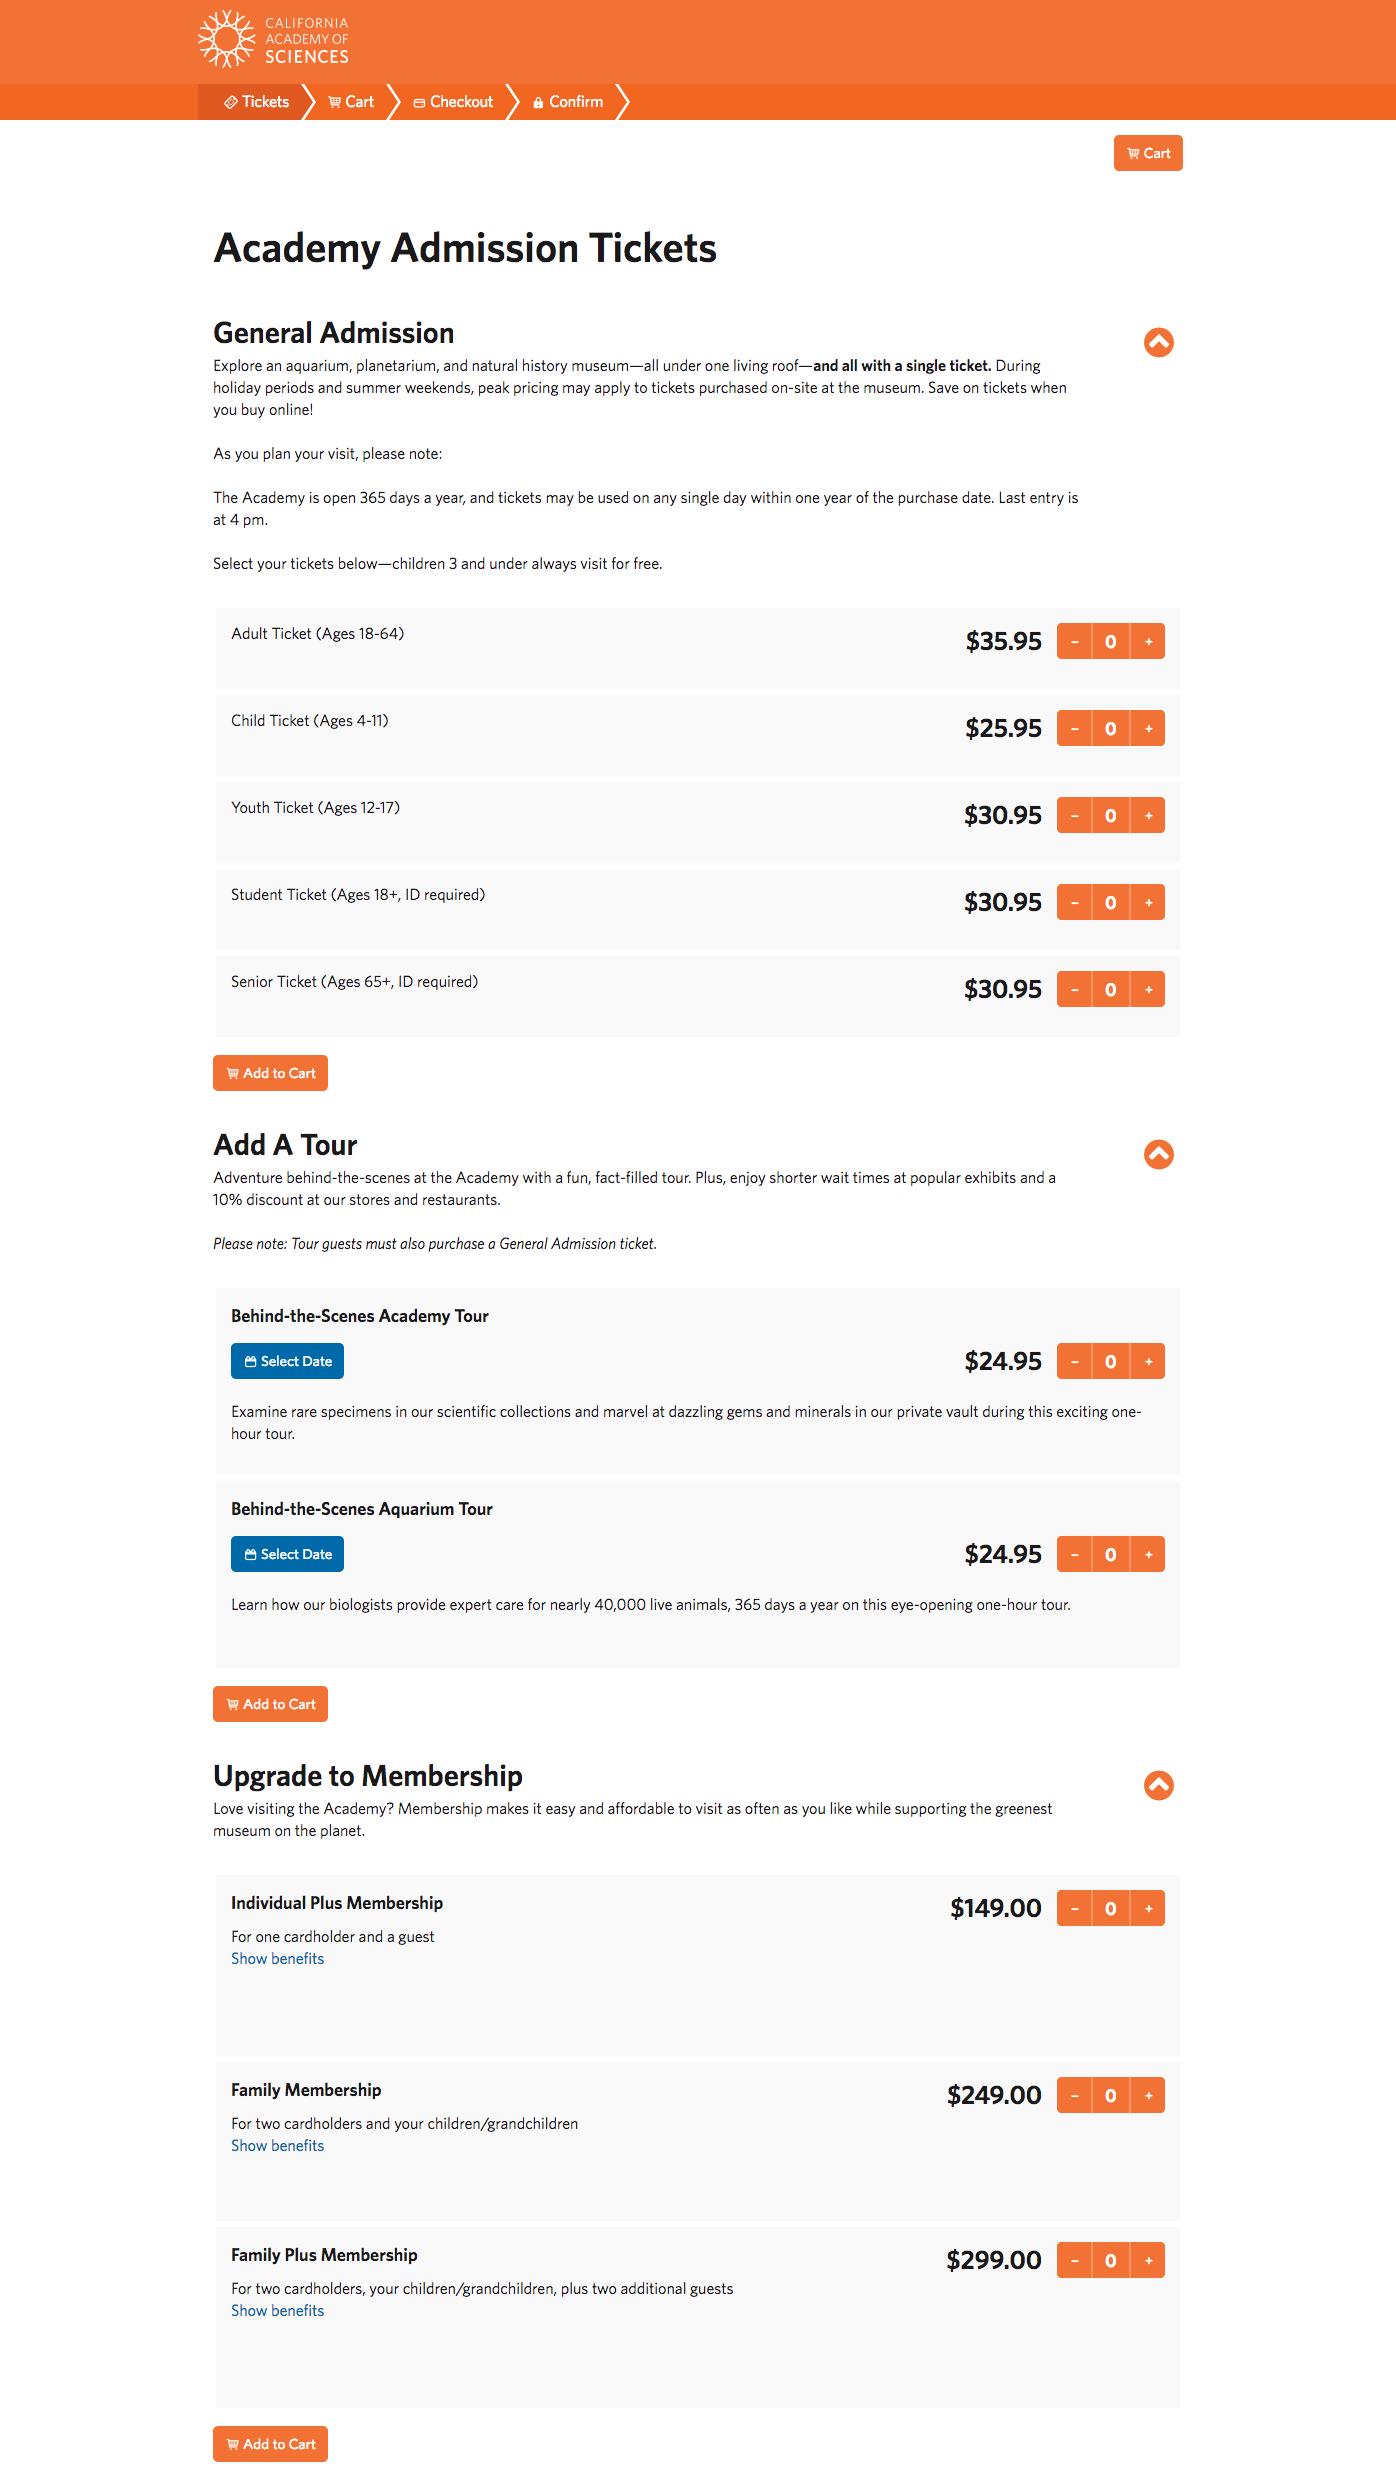 screenshot-ticketing.calacademy.org-2017-07-13-14-27-57.png